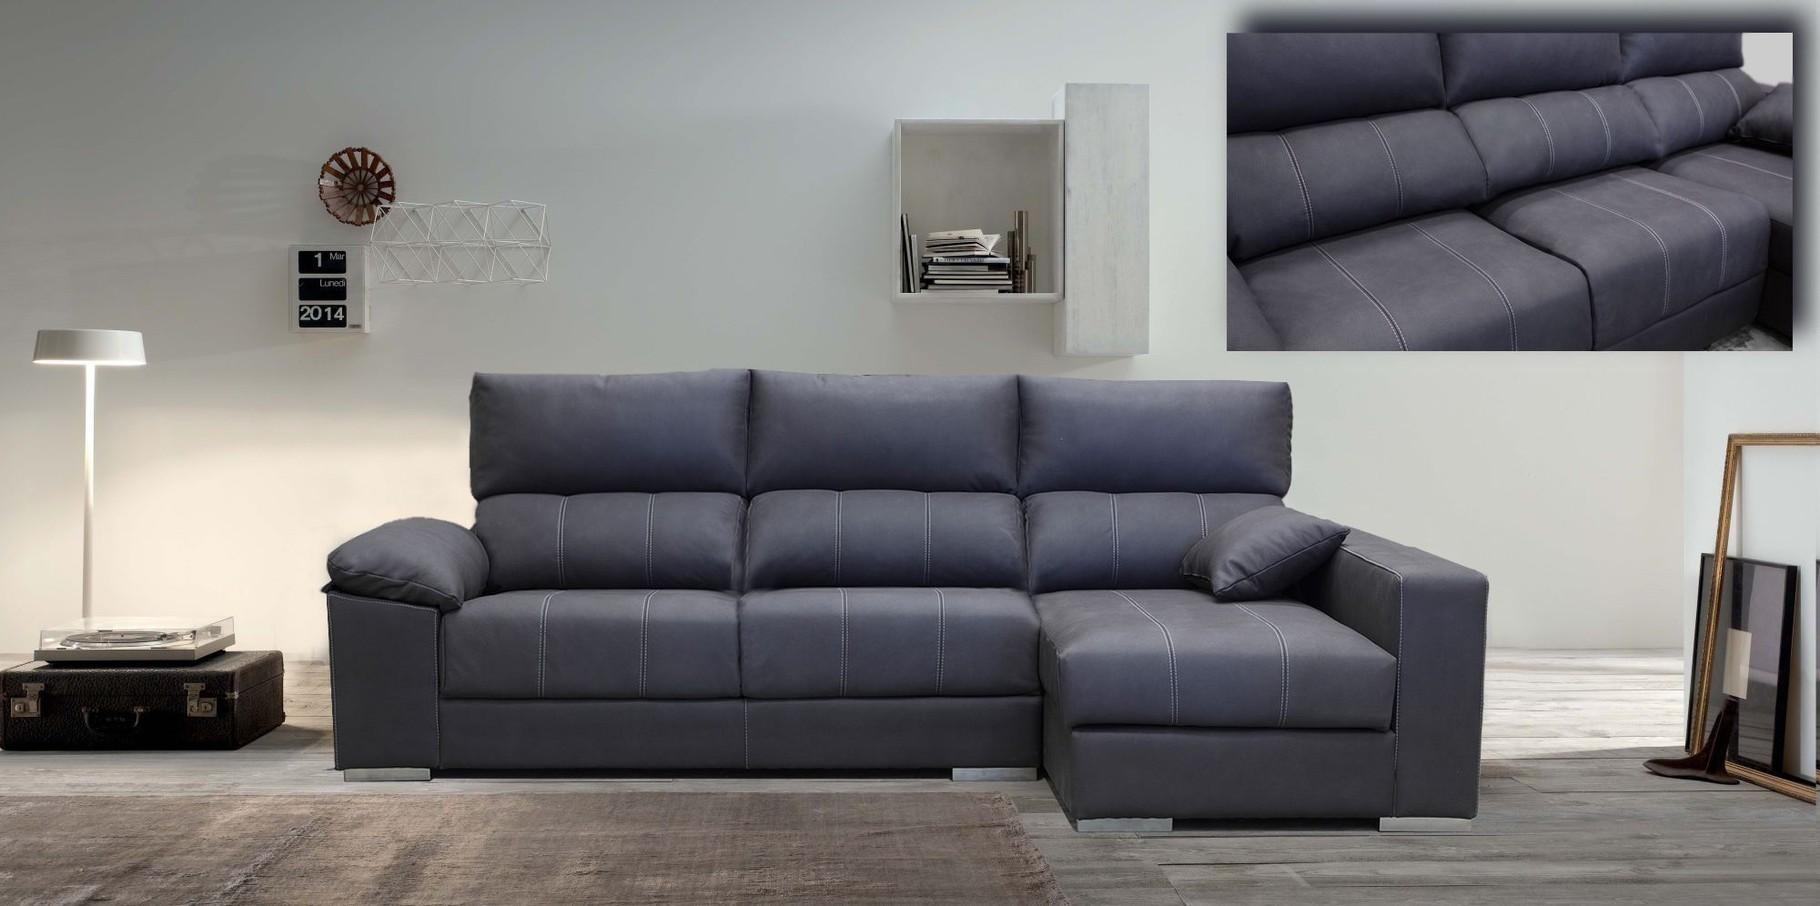 sofa cheslonge 285 cm dos puff extraible reclinable arcon en la ches solo 799€